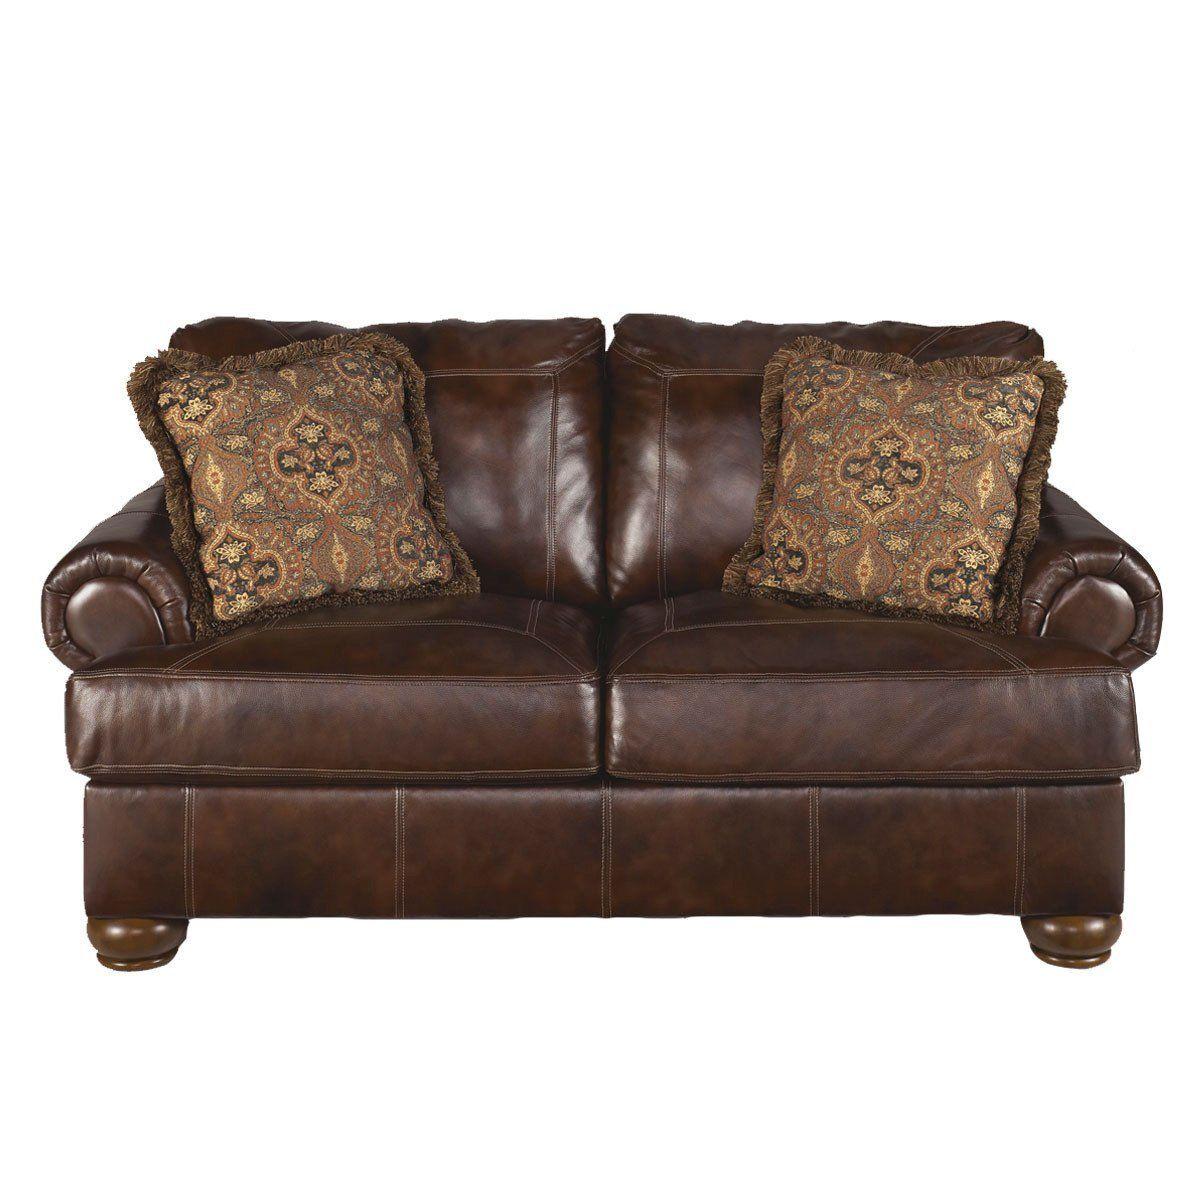 Axiom loveseat rustic living room furniture ashley